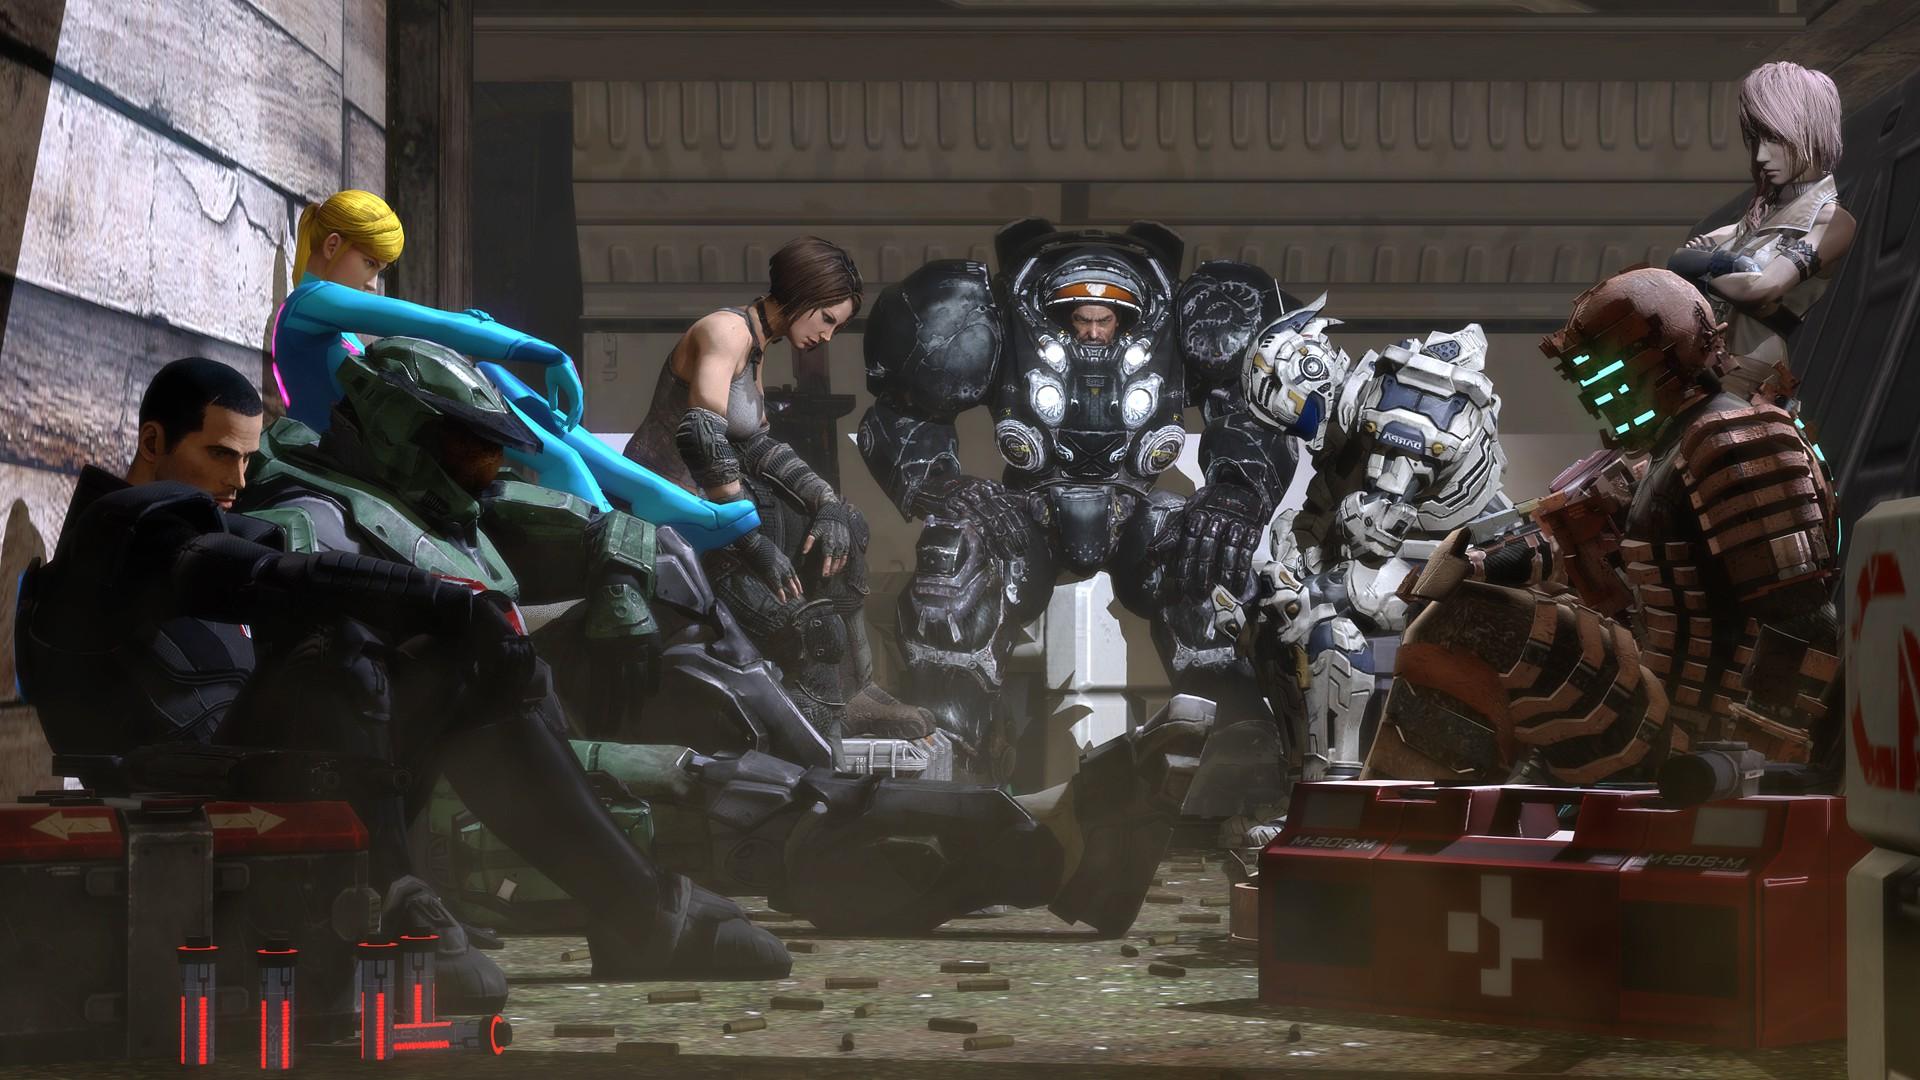 Starcraft Wallpaper Hd Video Games Fan Art Dead Space Halo Master Chief